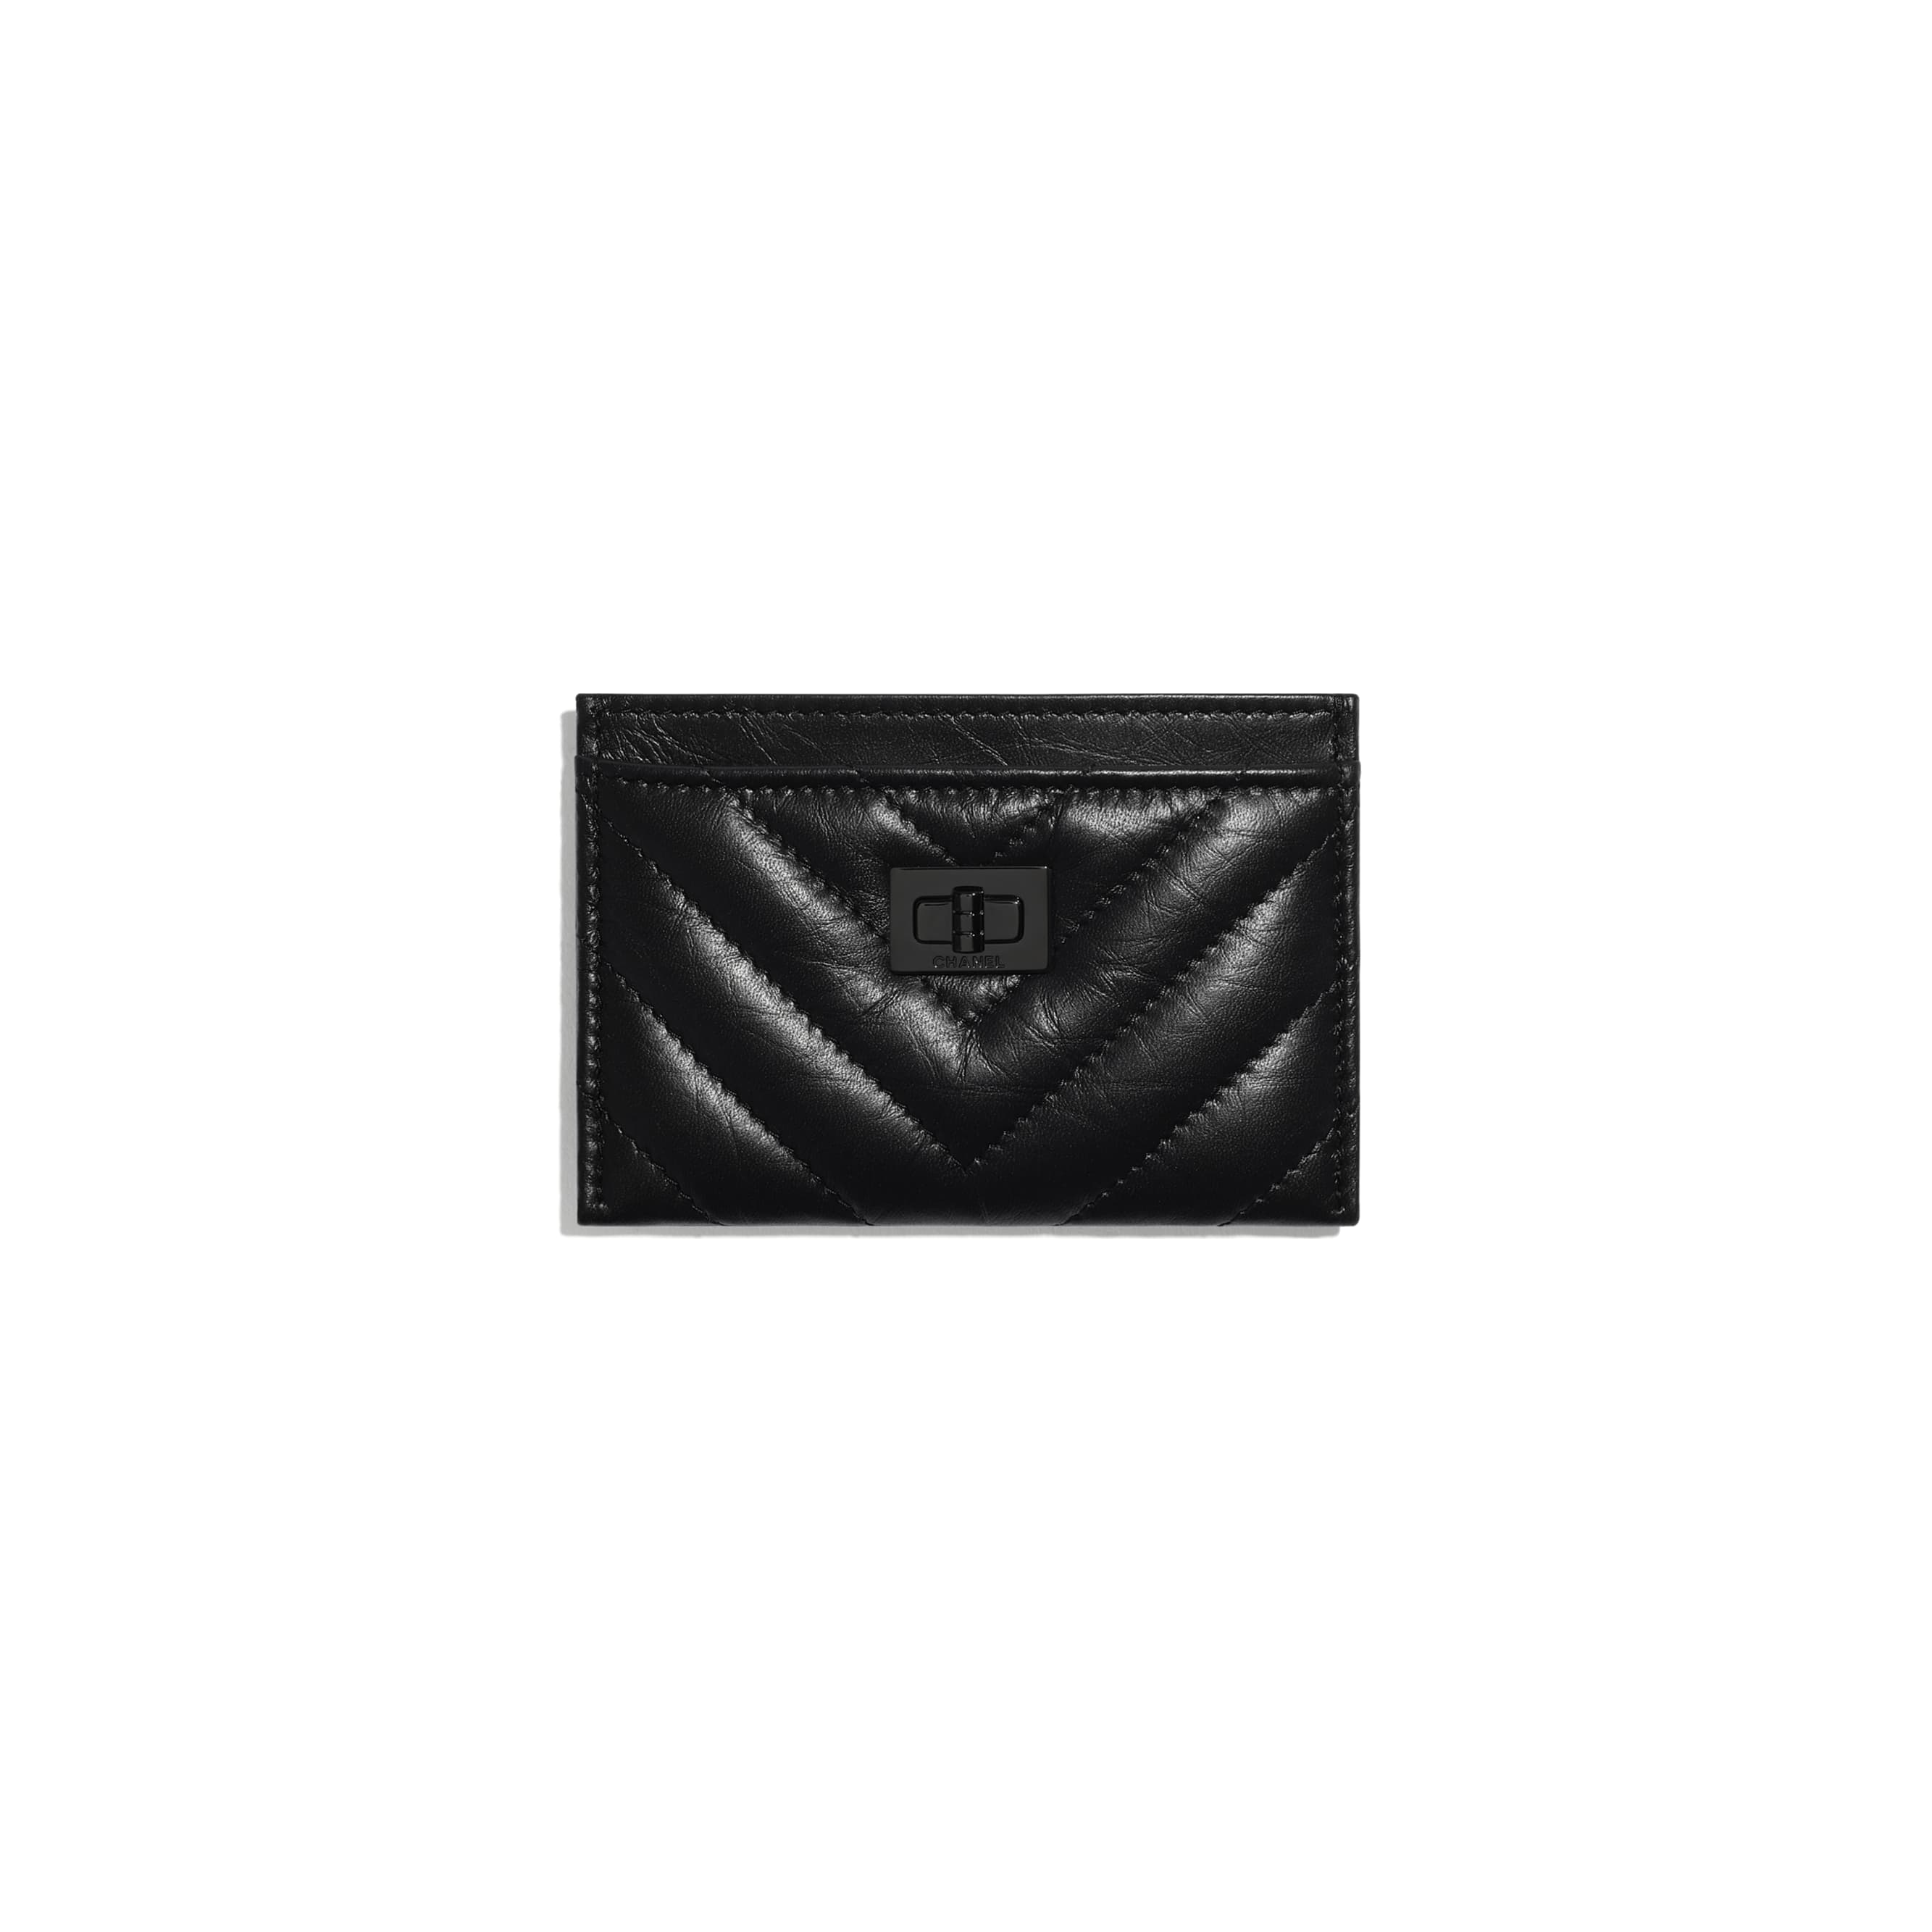 2.55 Card Holder - Black - Aged Calfskin & Black Metal - CHANEL - Default view - see standard sized version